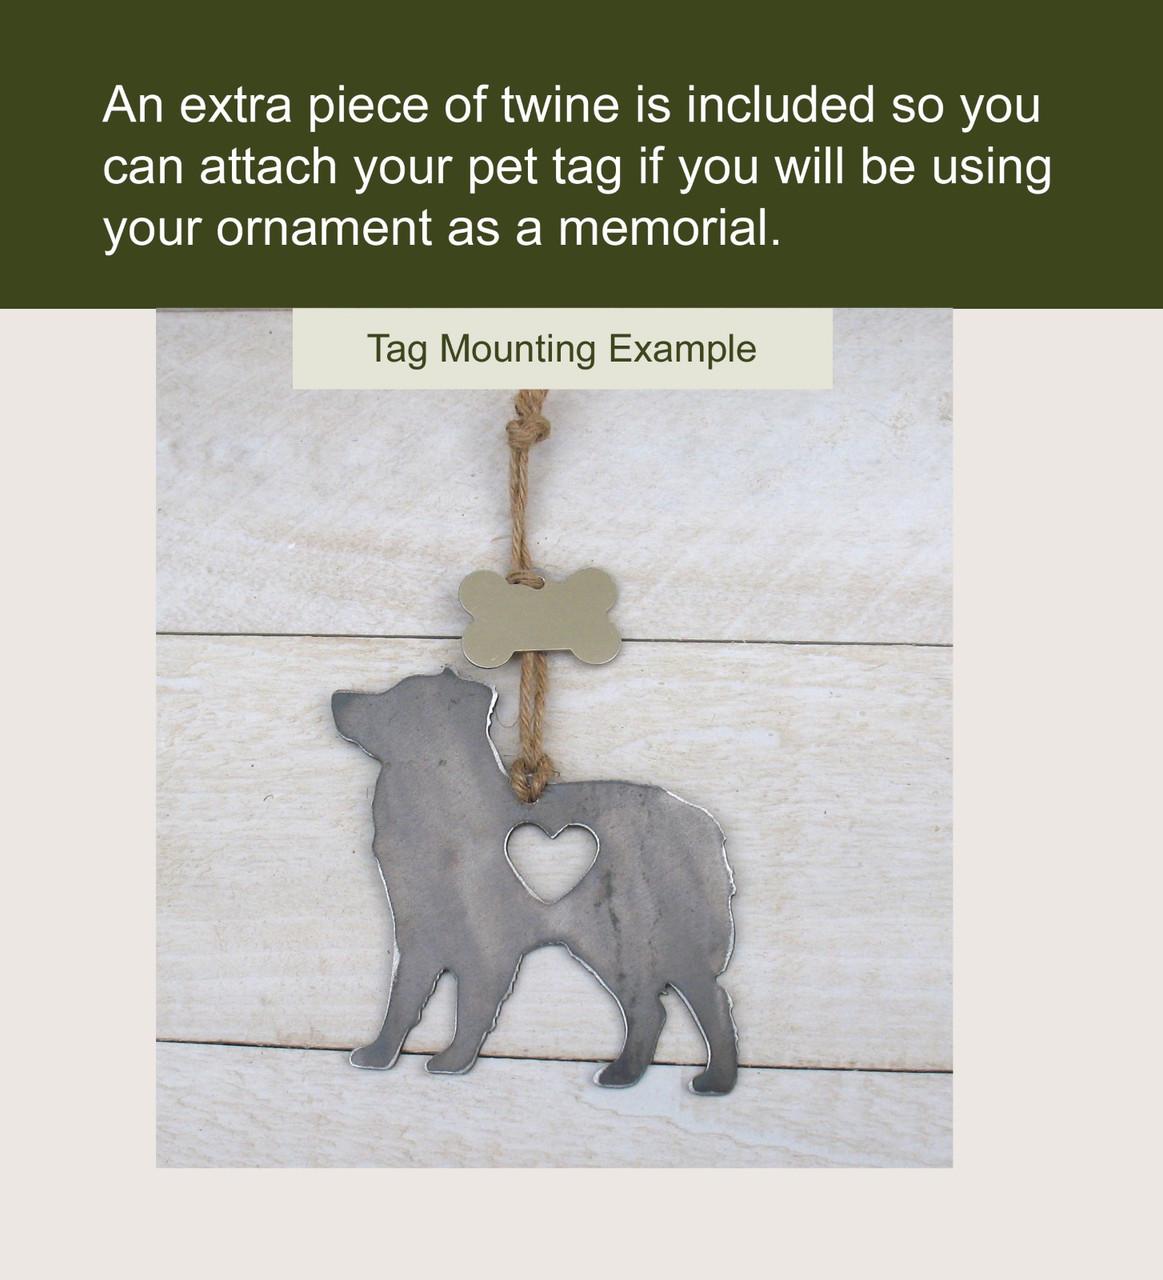 Boxer Dog Ornament 2 Pet Memorial W/ Angel Wings - Pet Loss Dog Sympathy Remembrance Gift - Metal Dog Christmas Ornament